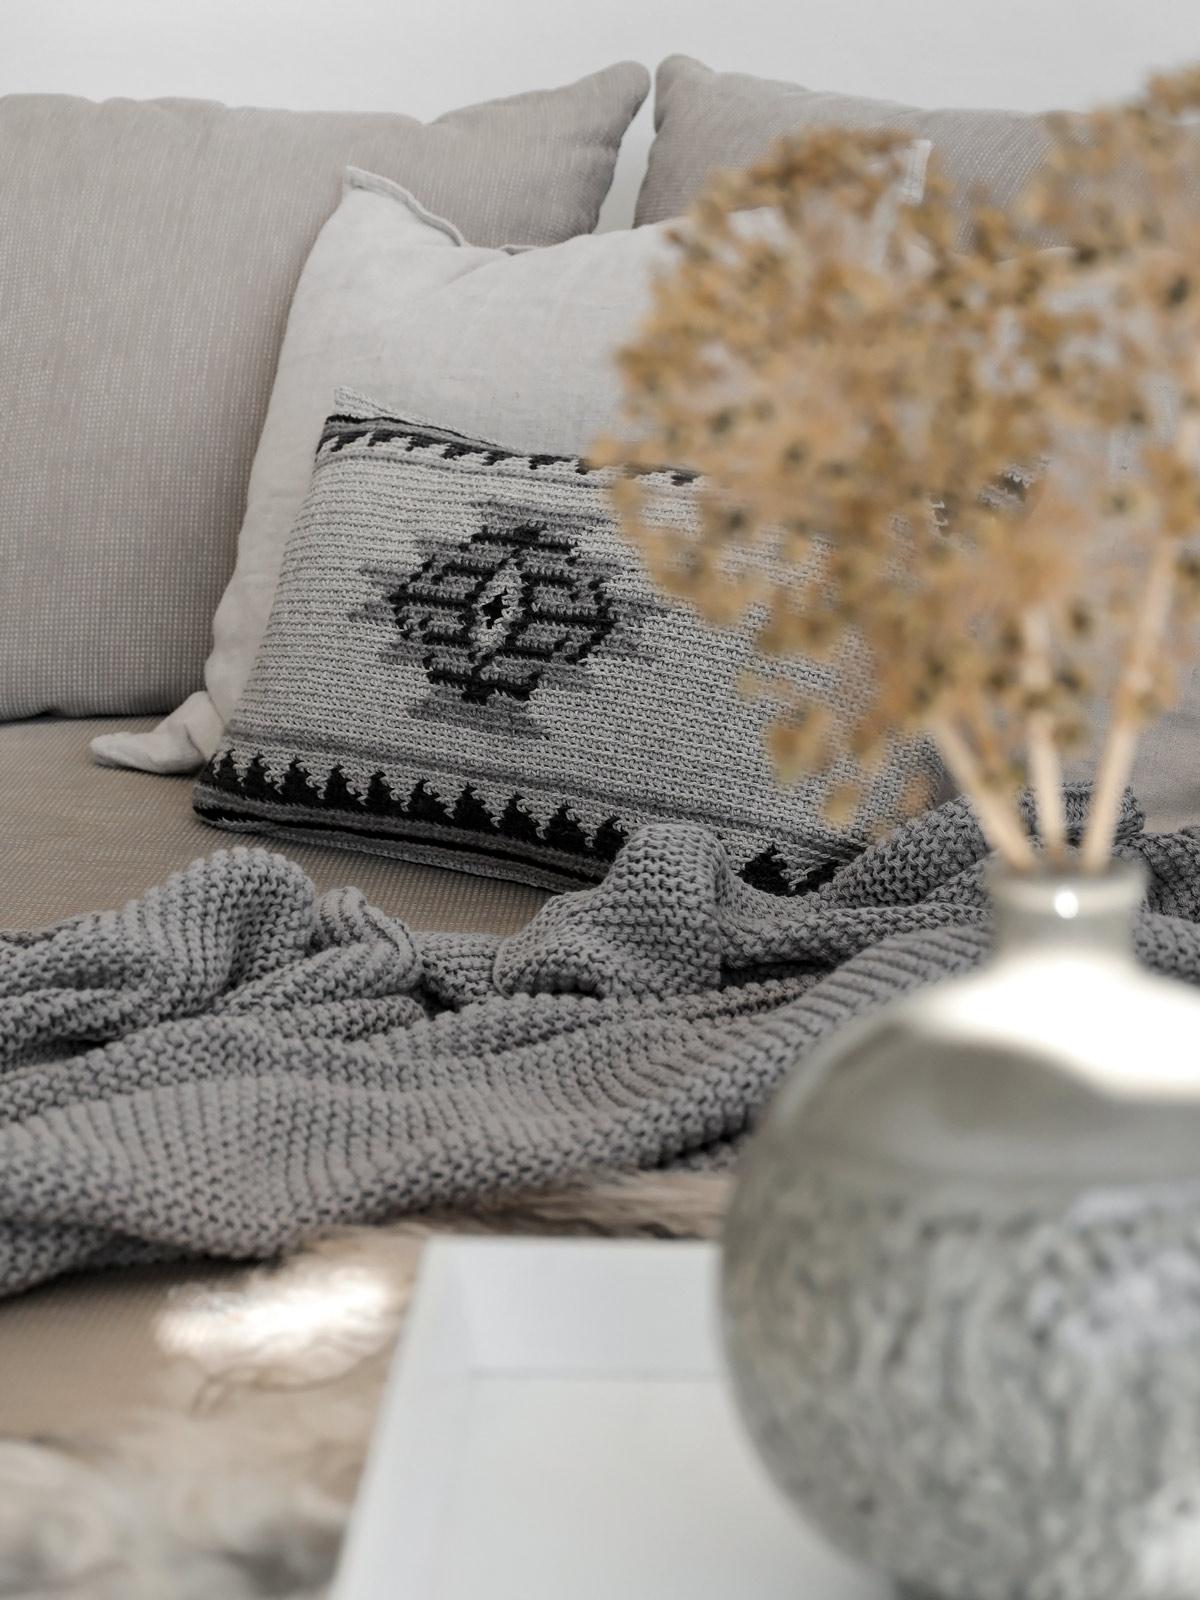 DIY | Kissenhülle im Ethnomuster aus Wollresten - mxliving